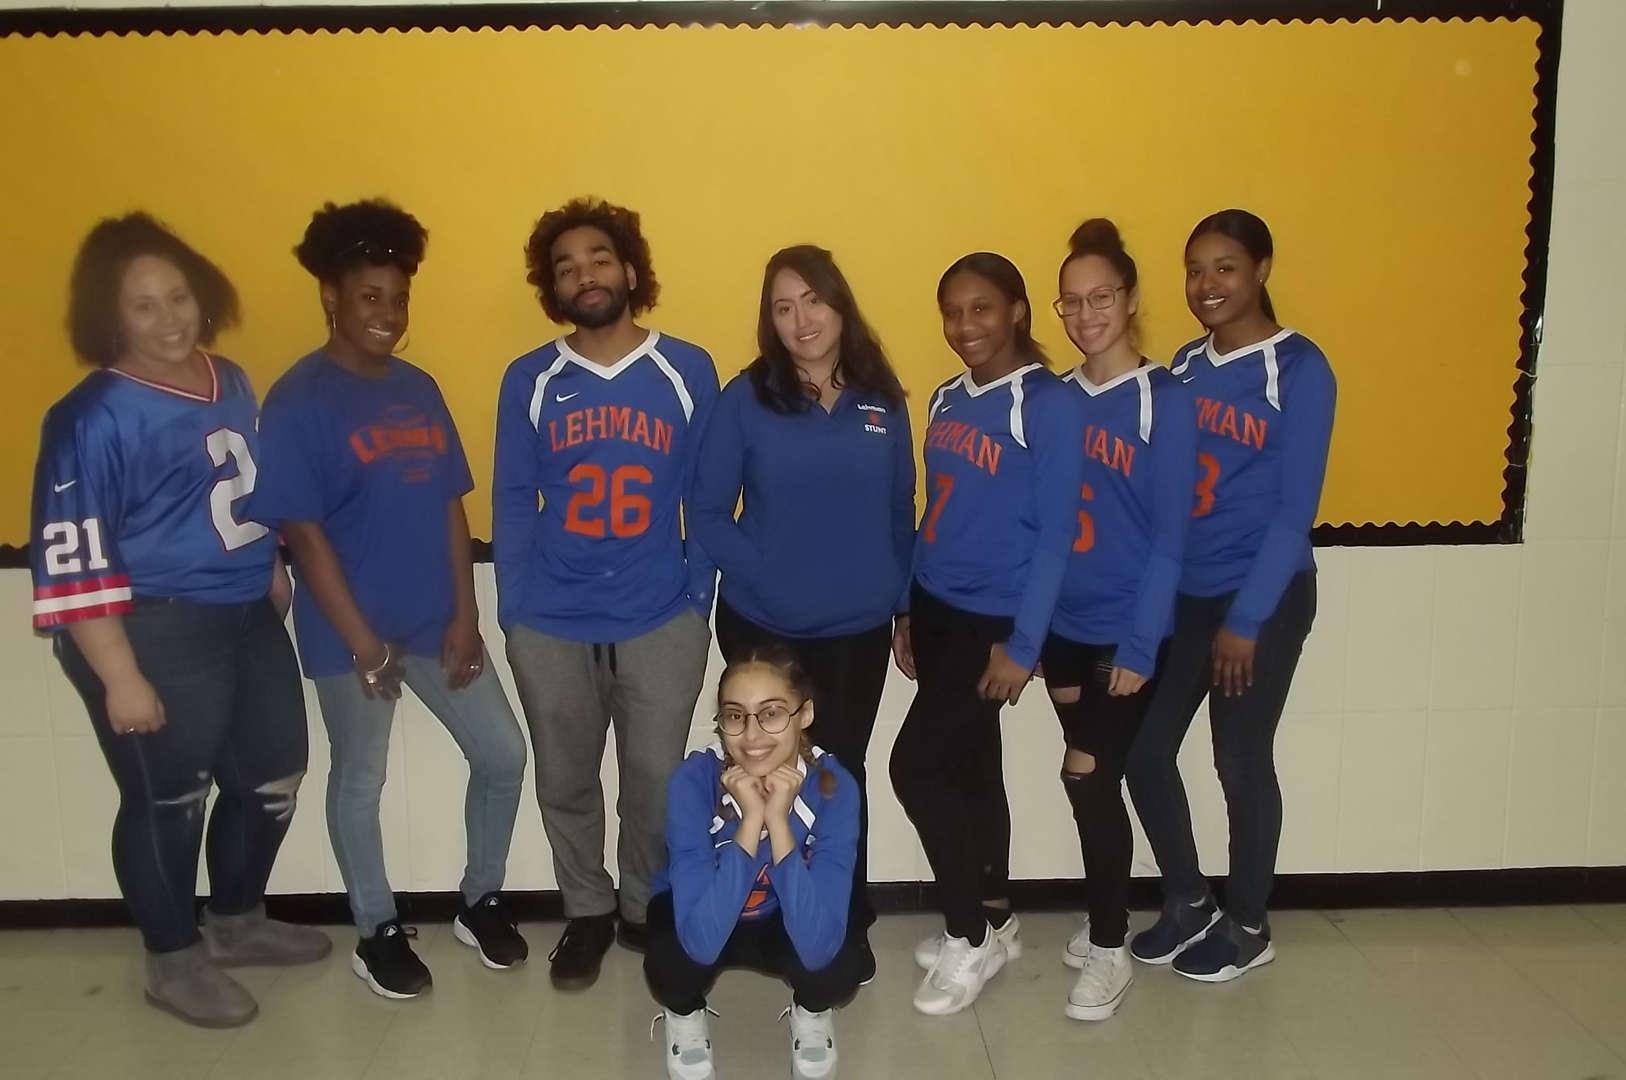 Lehman cheer students for sports day 2017-2018 Spirit Week #2